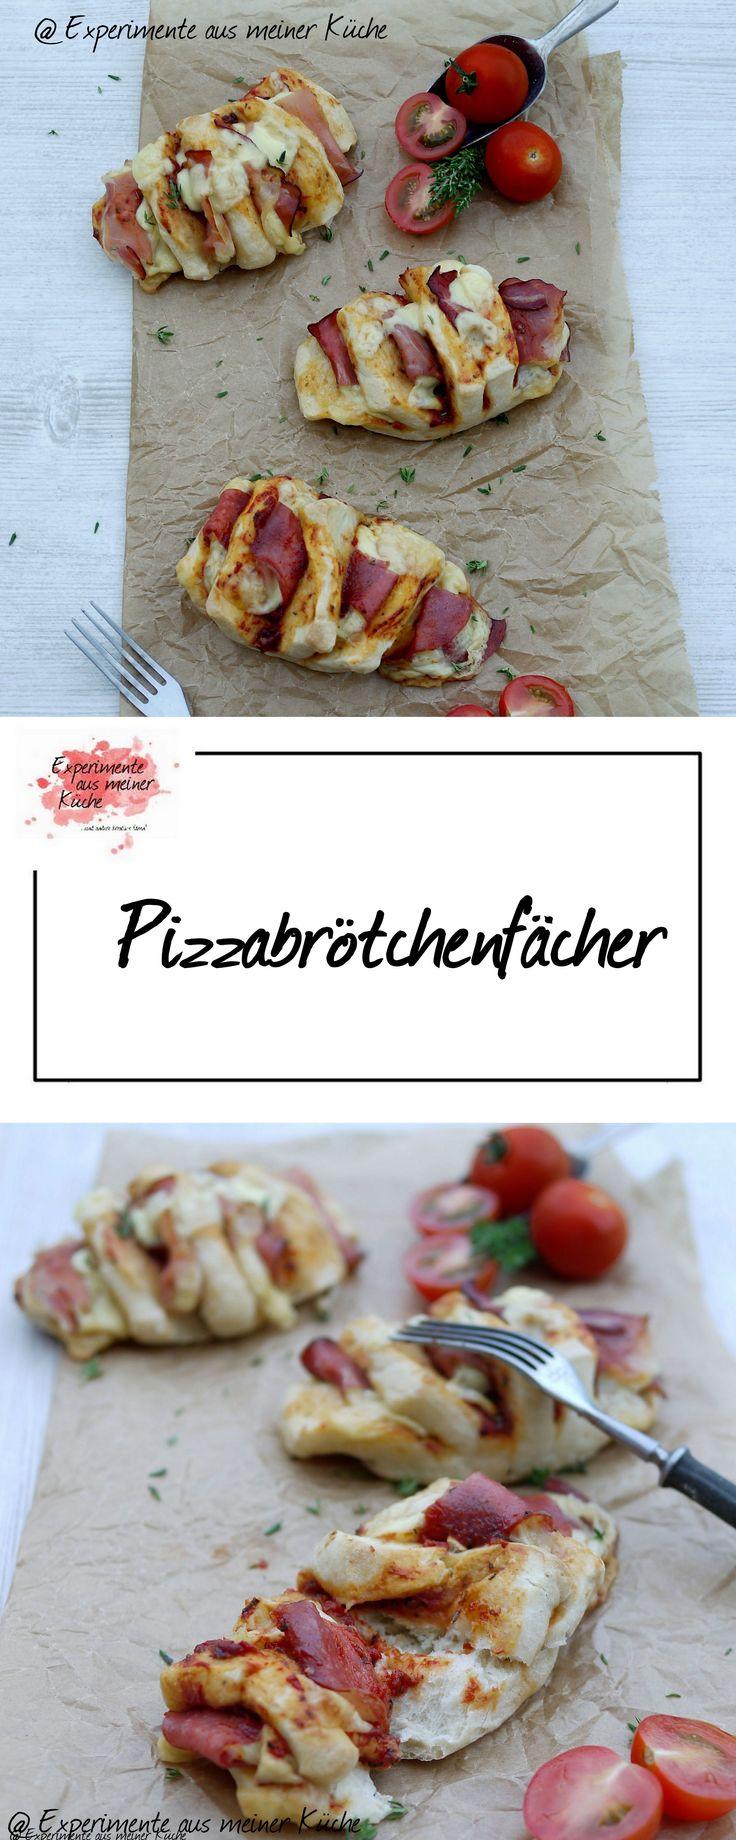 Pizzabrötchenfächer | Rezept | Essen | Fingerfood | Party